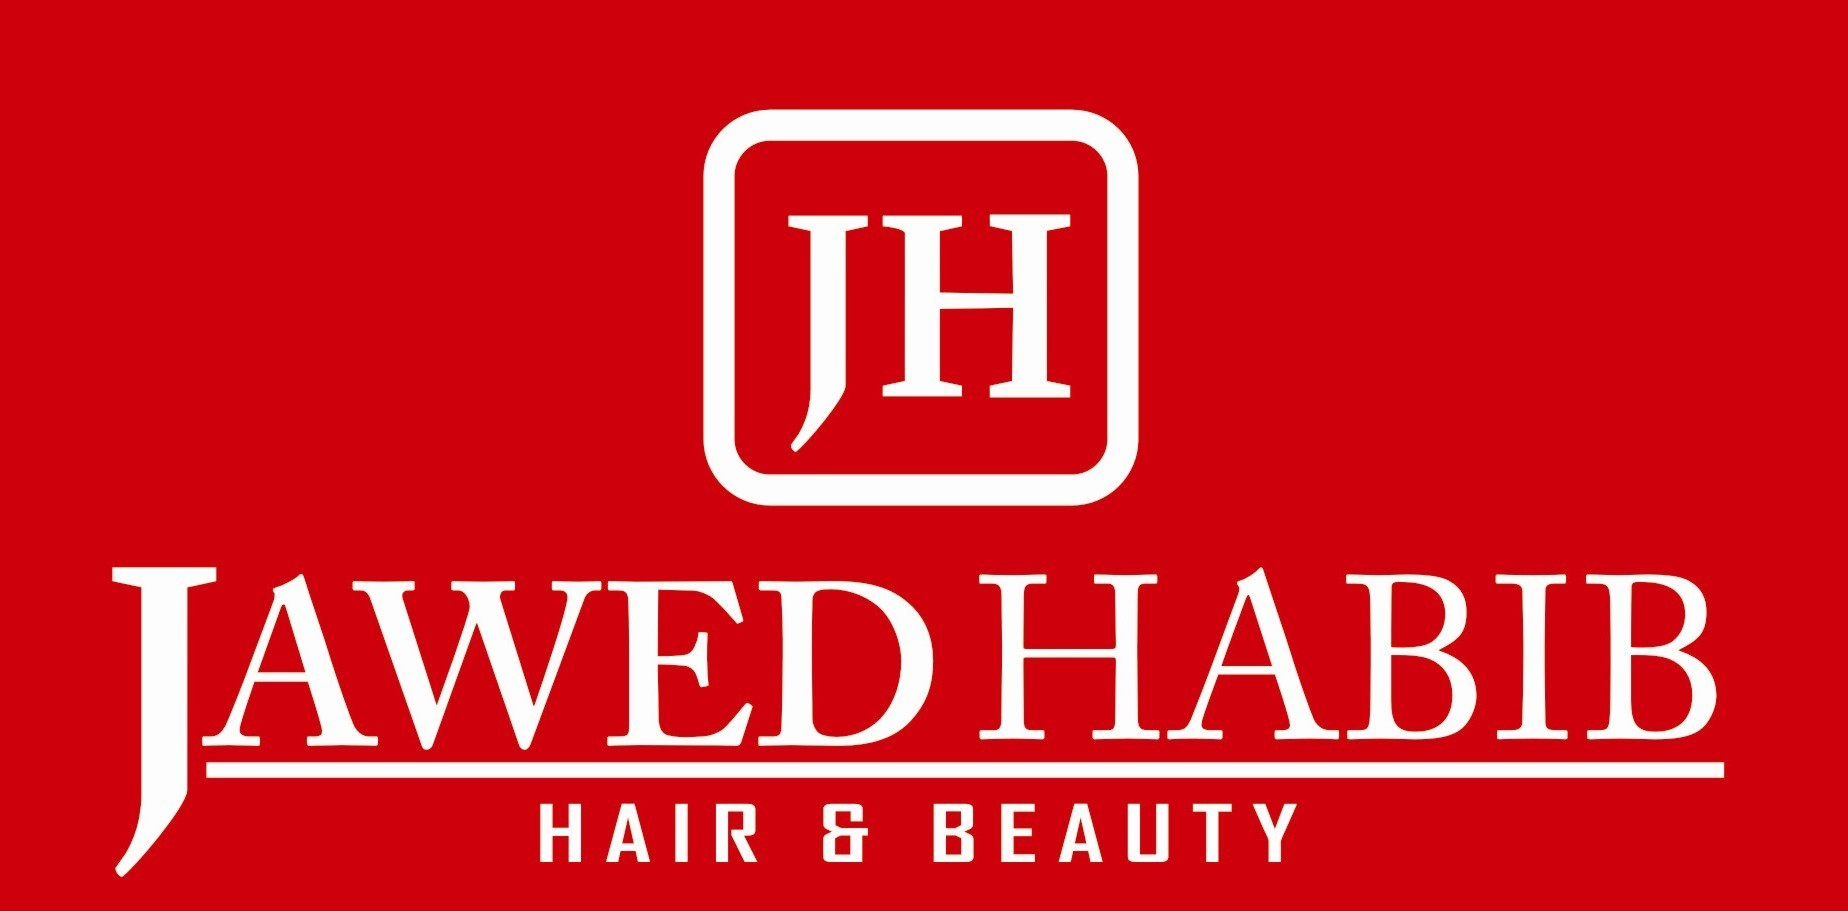 Jawed Habib Hair & Beauty Salons - Bhatar Road - Surat Image